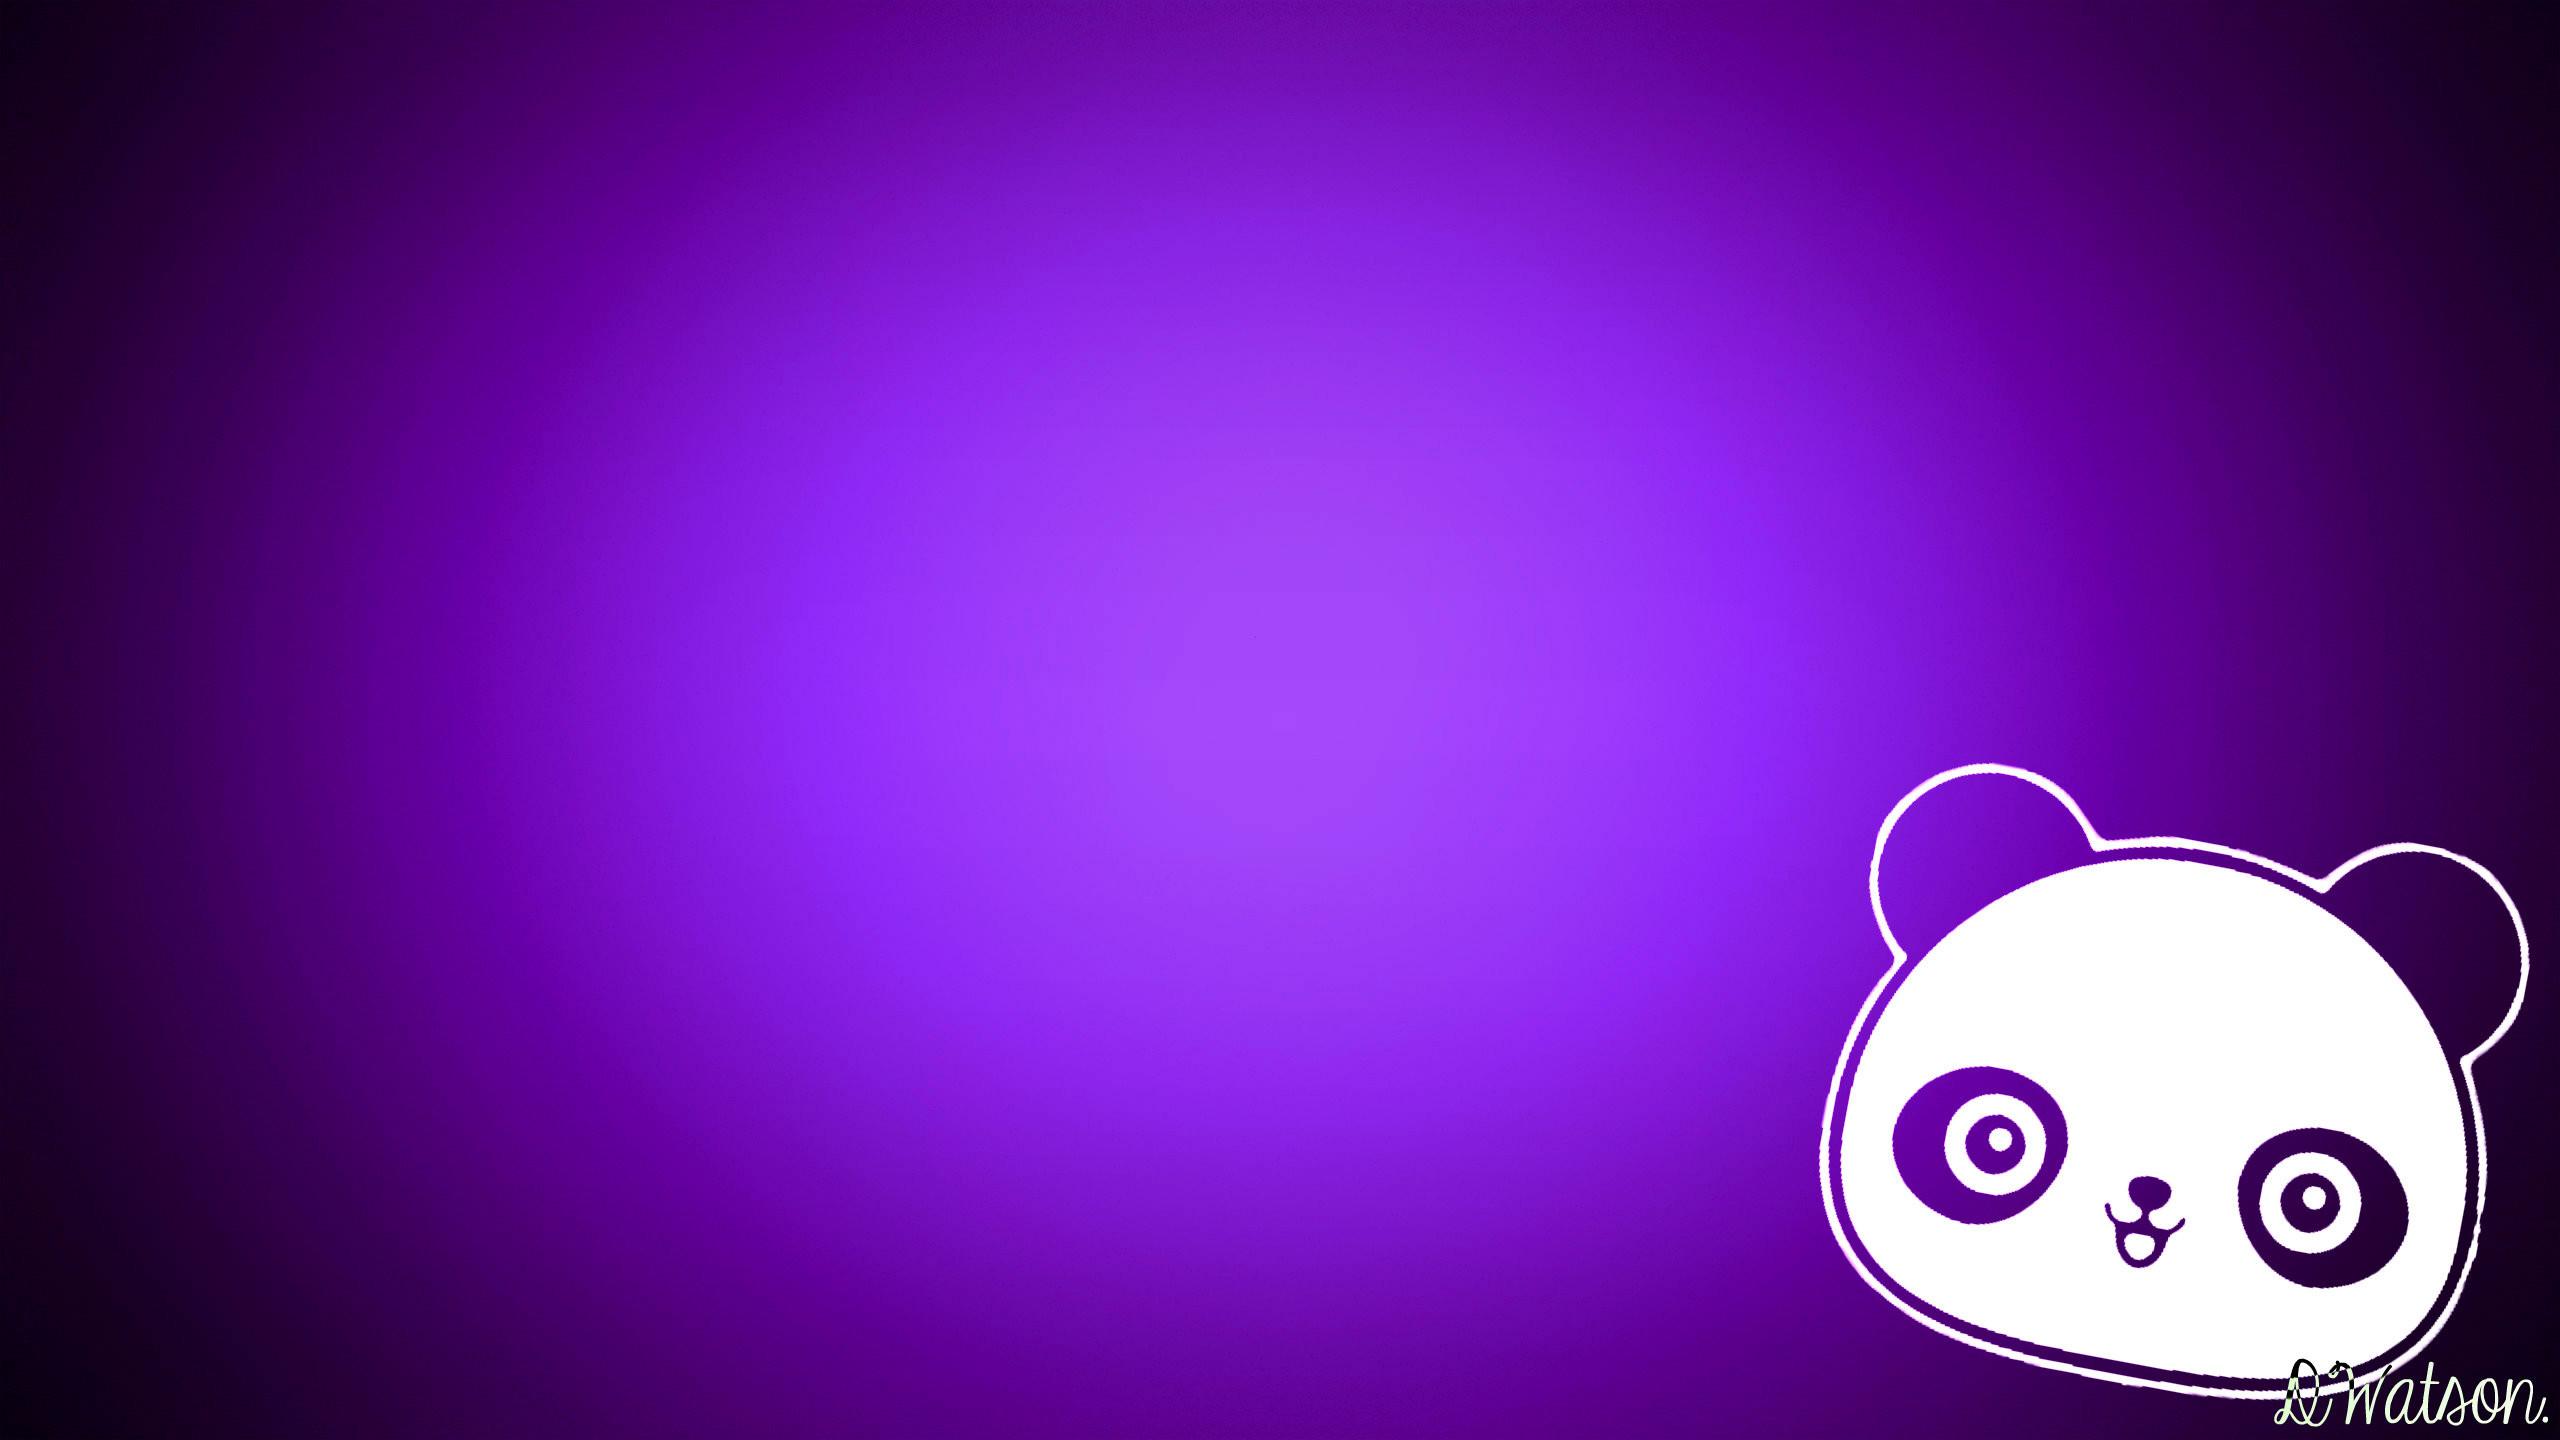 Cute purple panda background